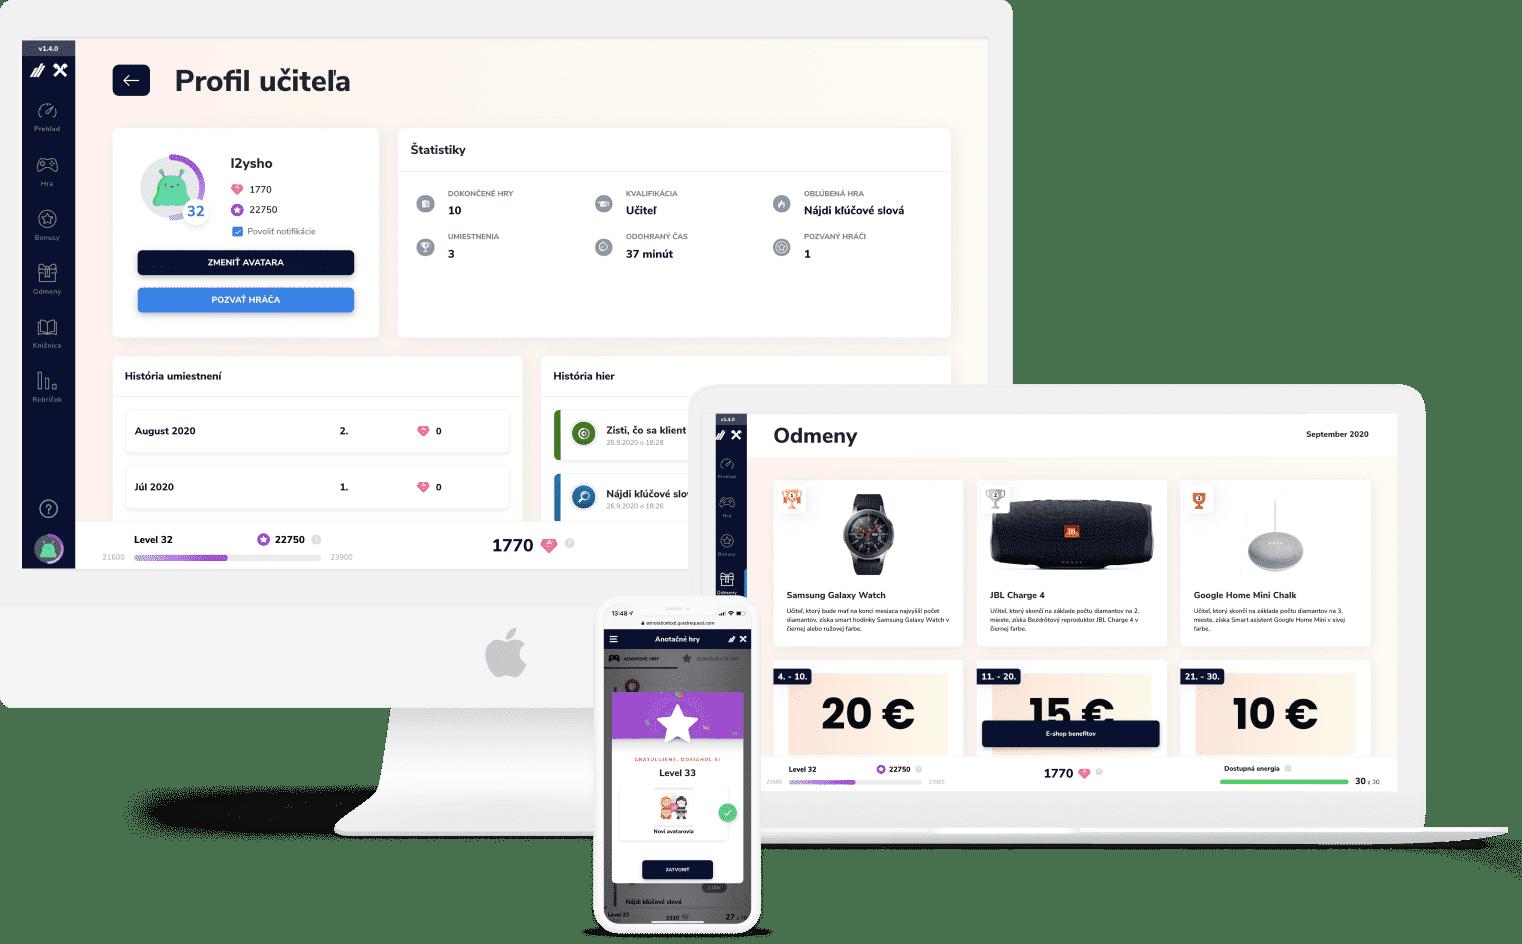 Responzivny web dizajn anotacna platforma adam